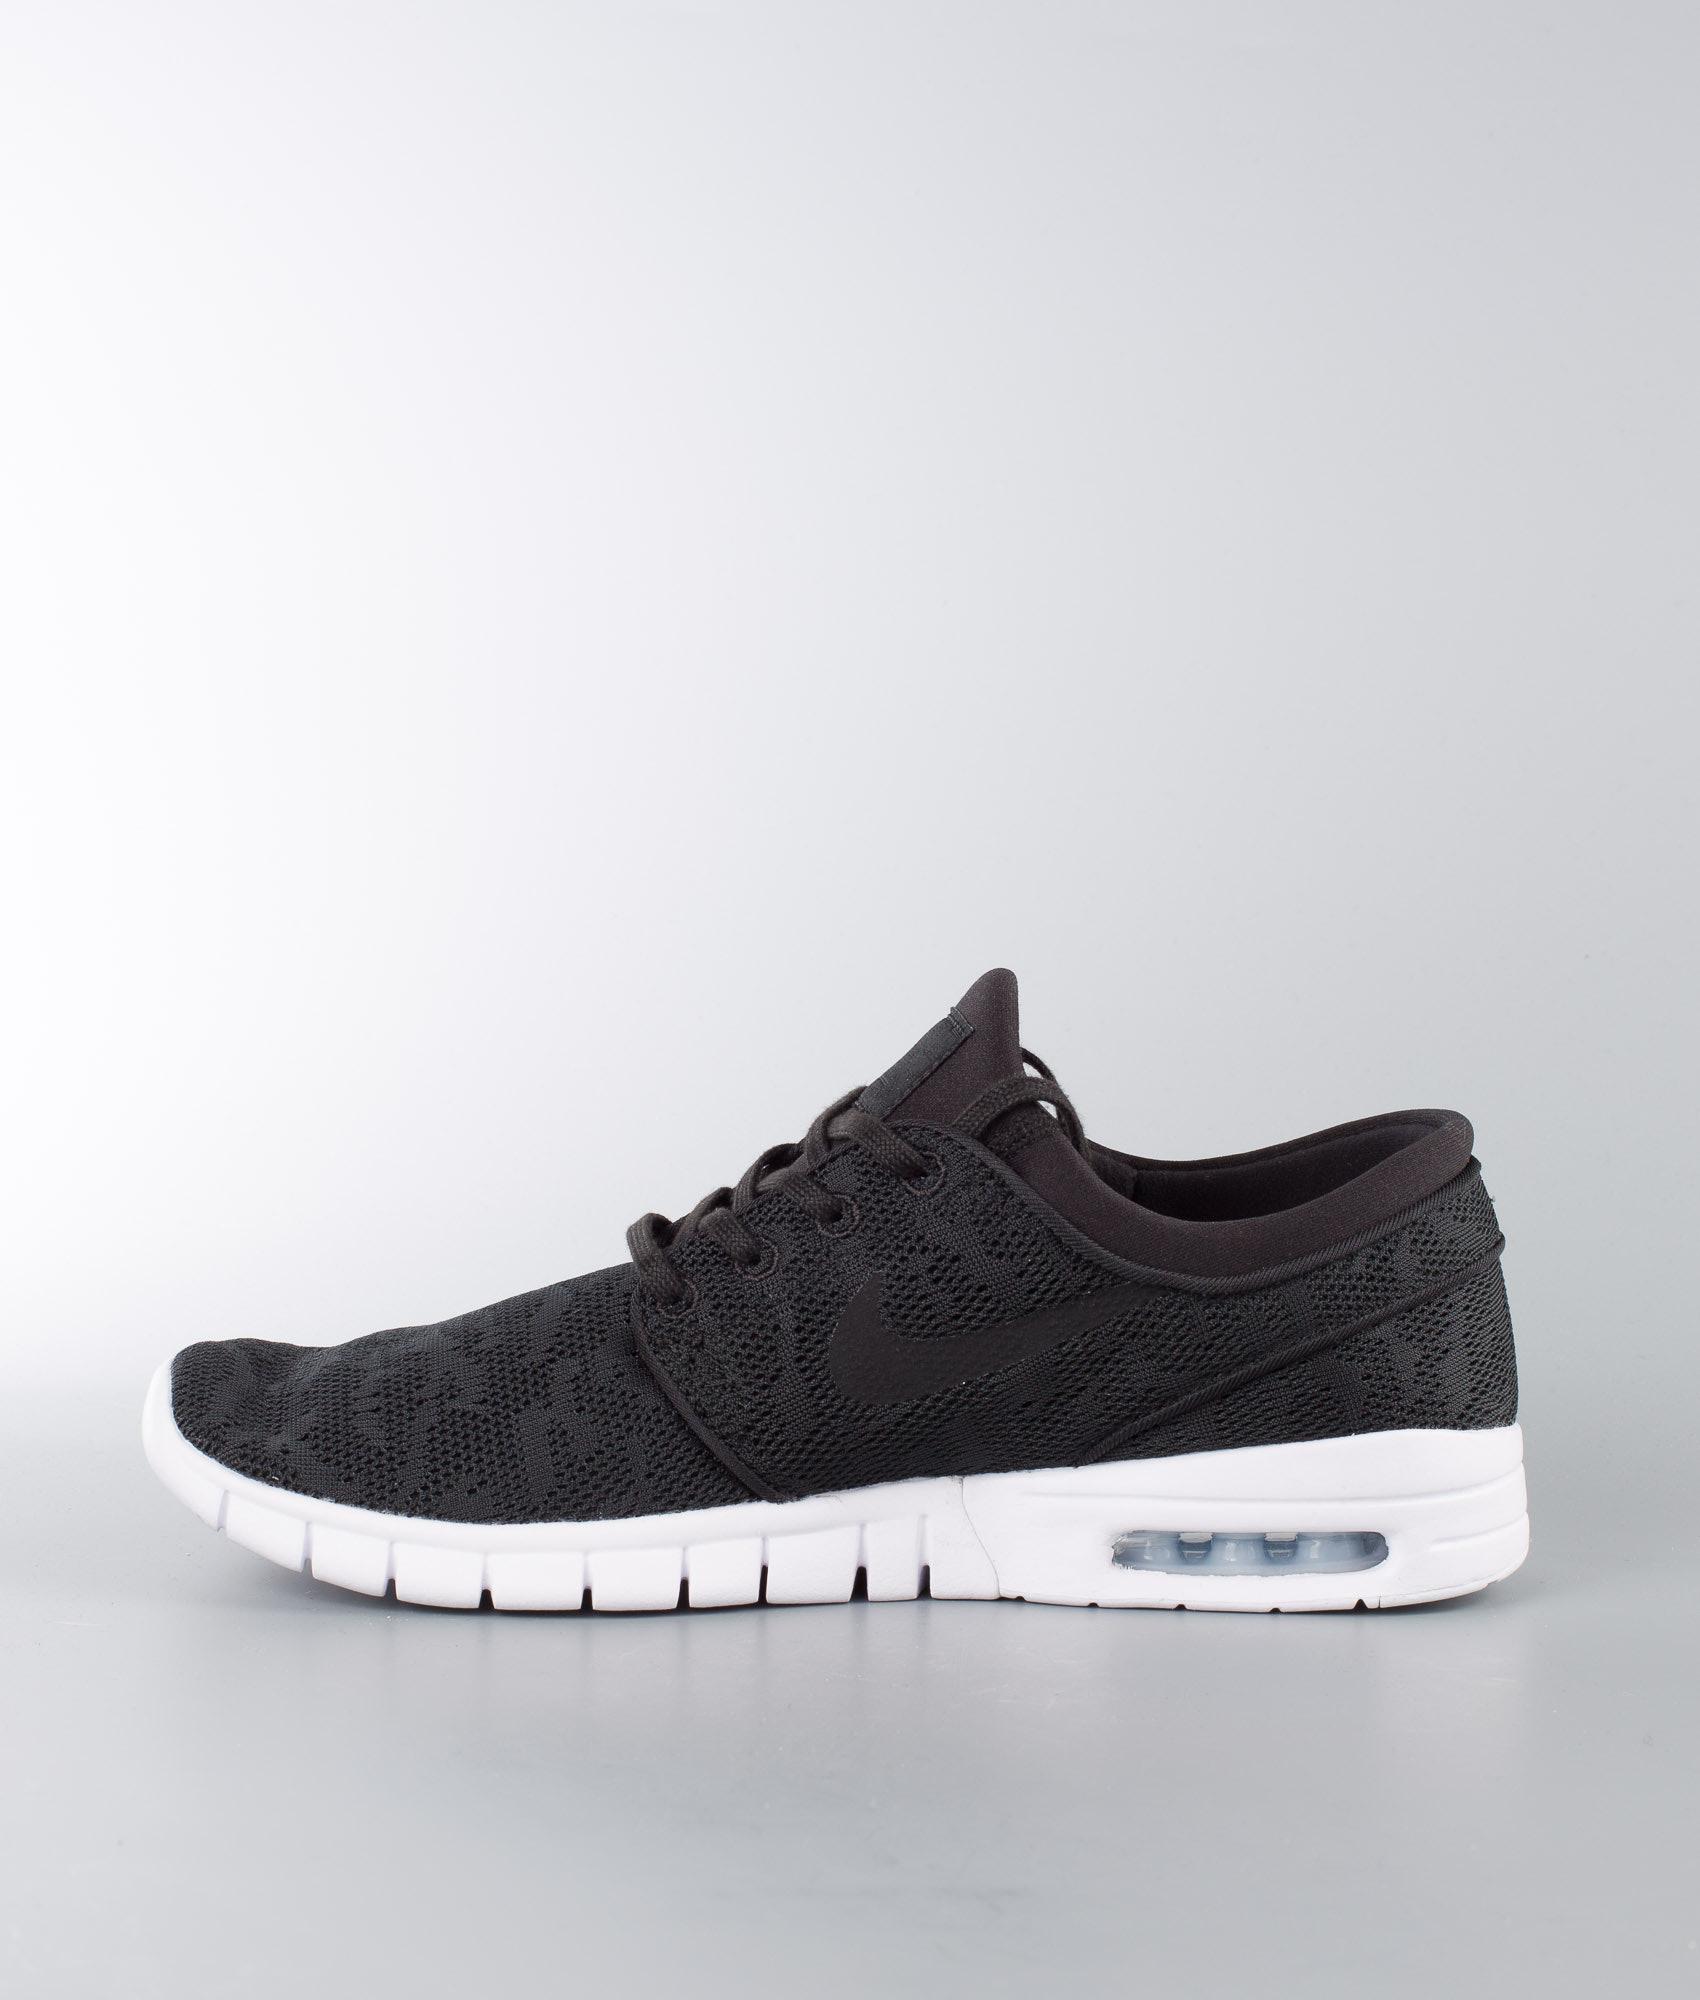 Nike Stefan Janoski Max Shoes Black Black-White - Ridestore.com db450d5947